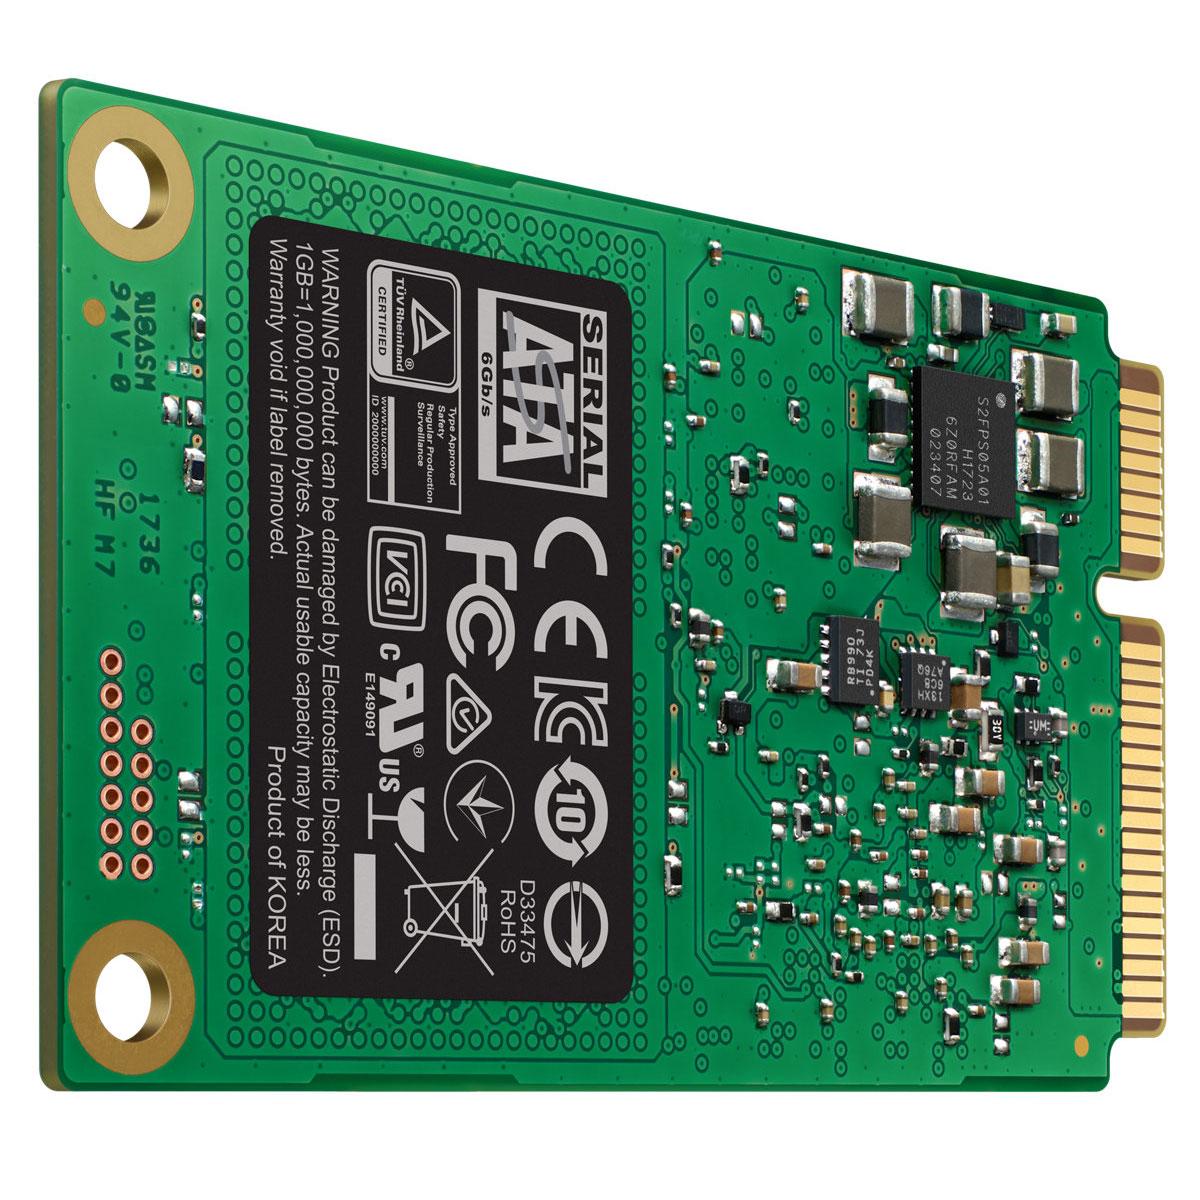 Samsung 860 EVO 240-275Go - Disque SSD Samsung - Cybertek.fr - 1